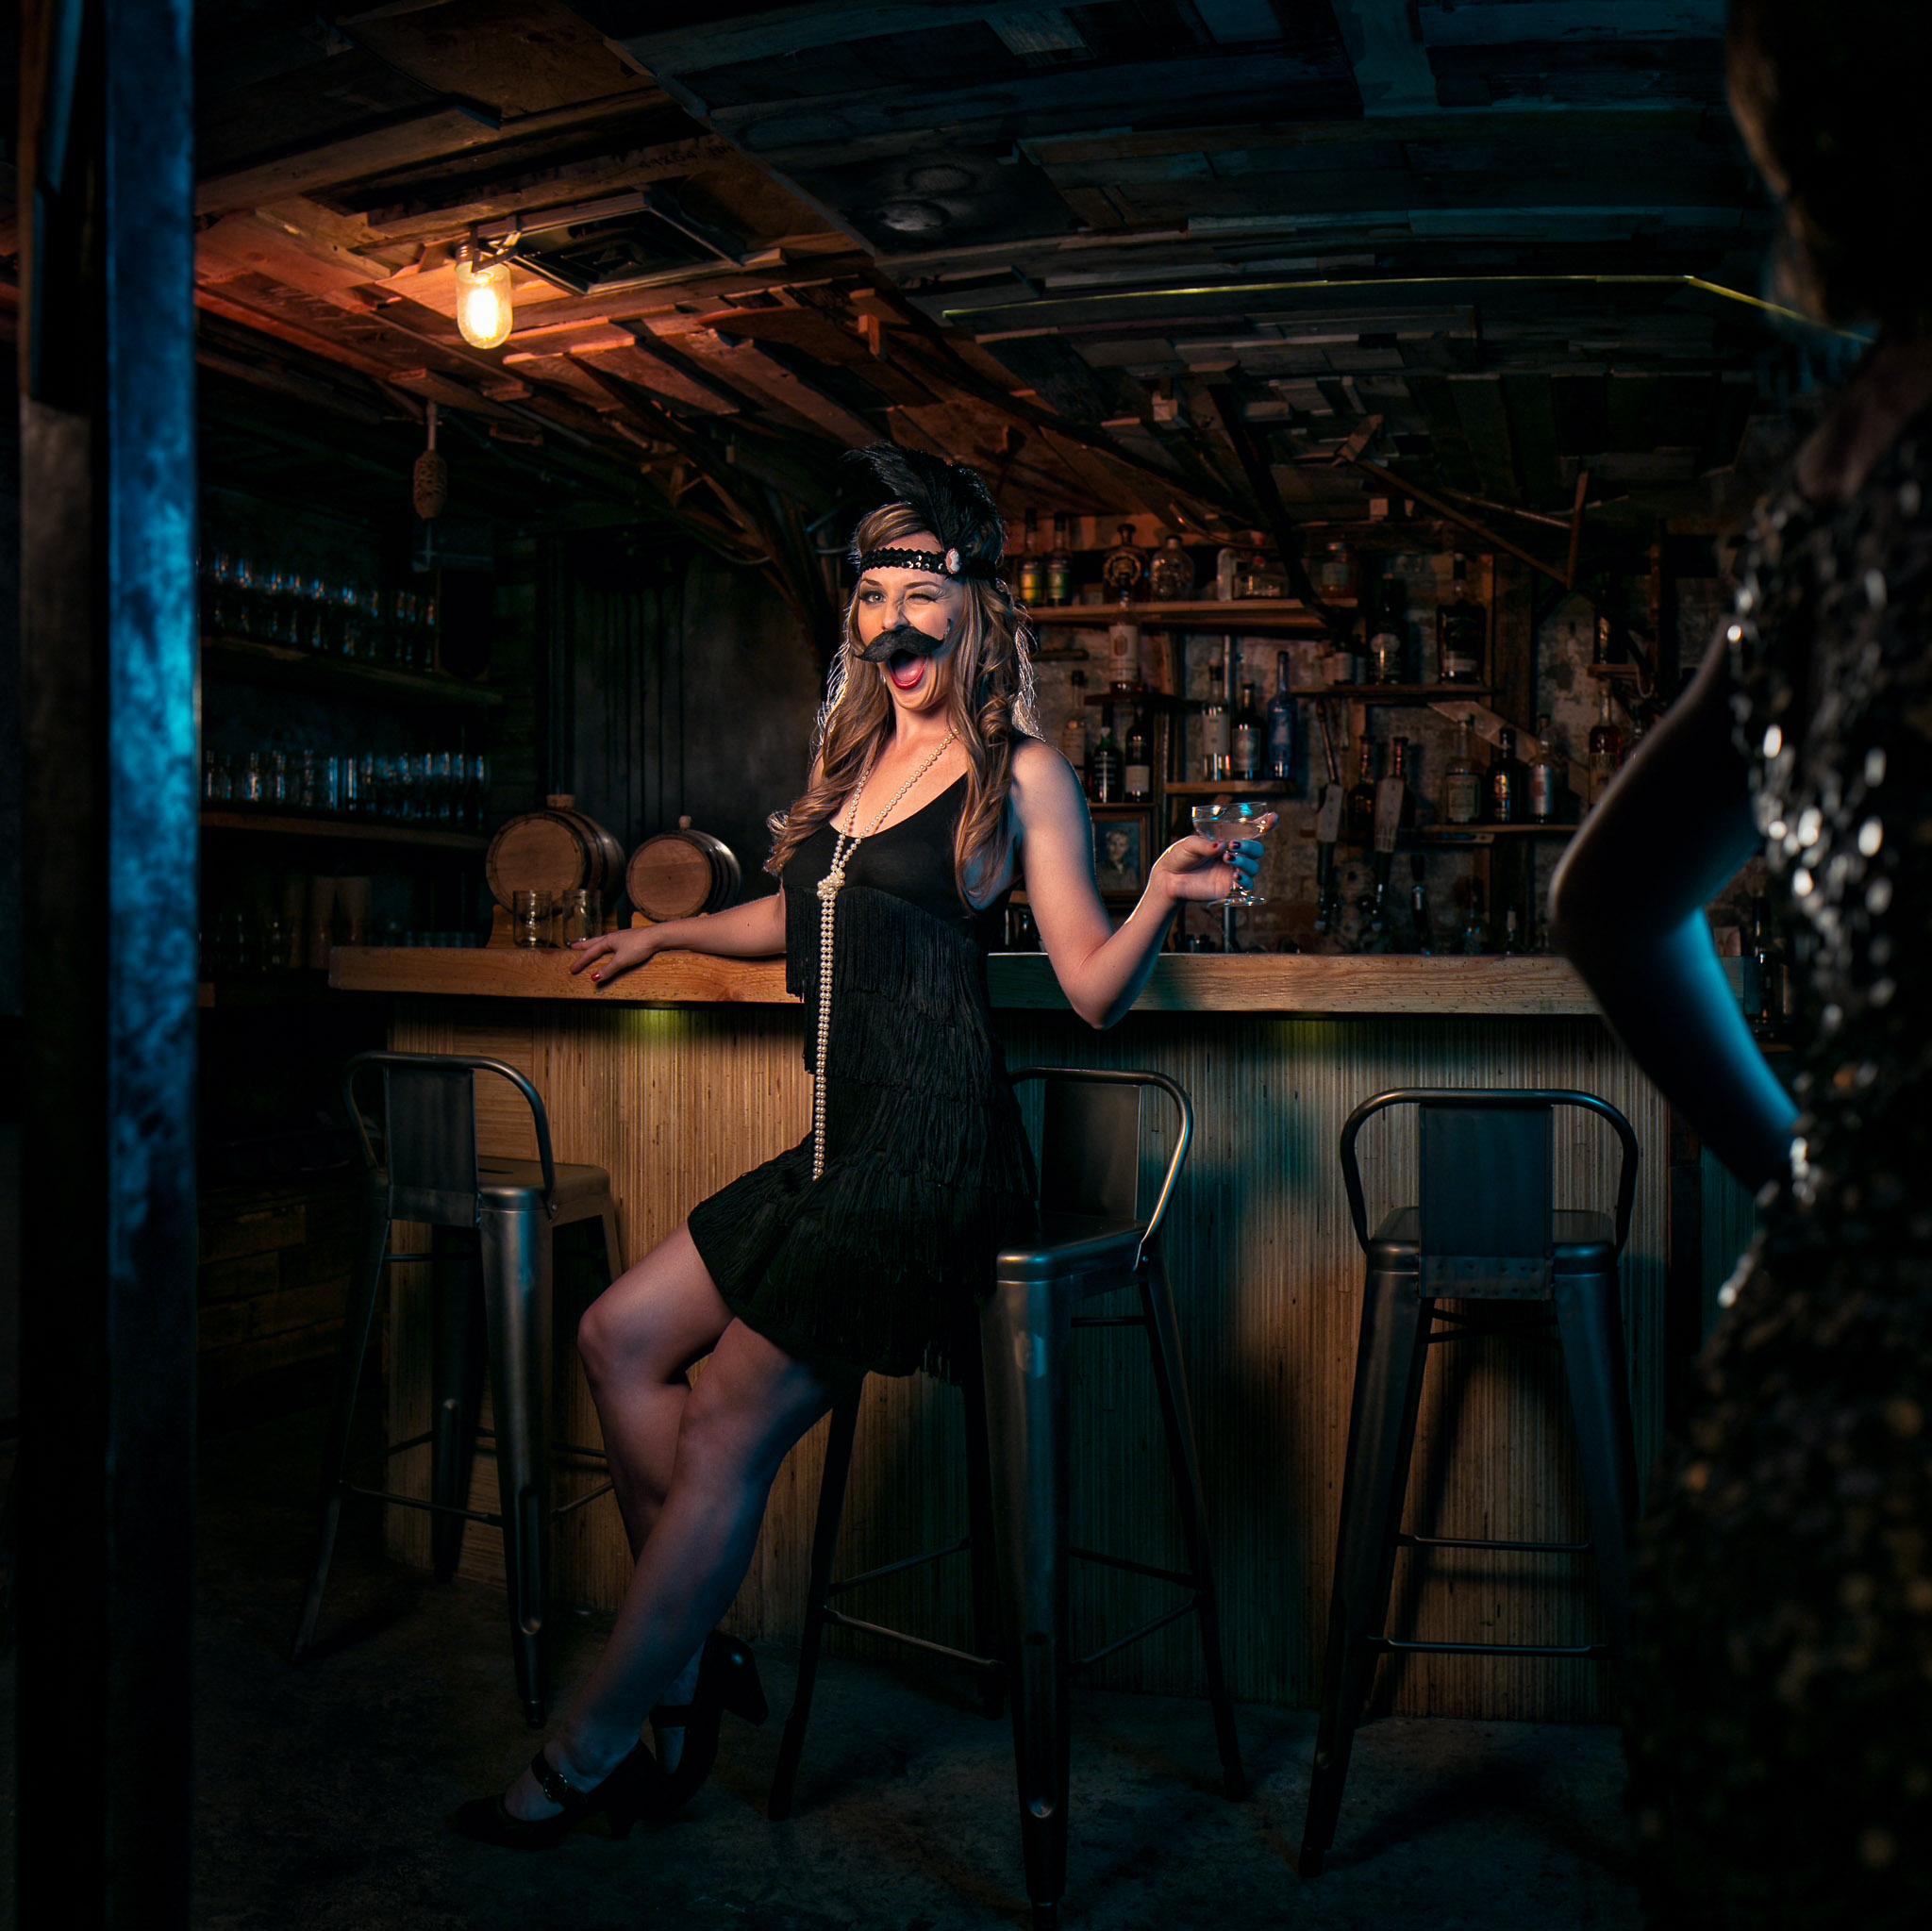 Ottawa Portrait Photographer Justin Van Leeuwen - Suzy Kendrick